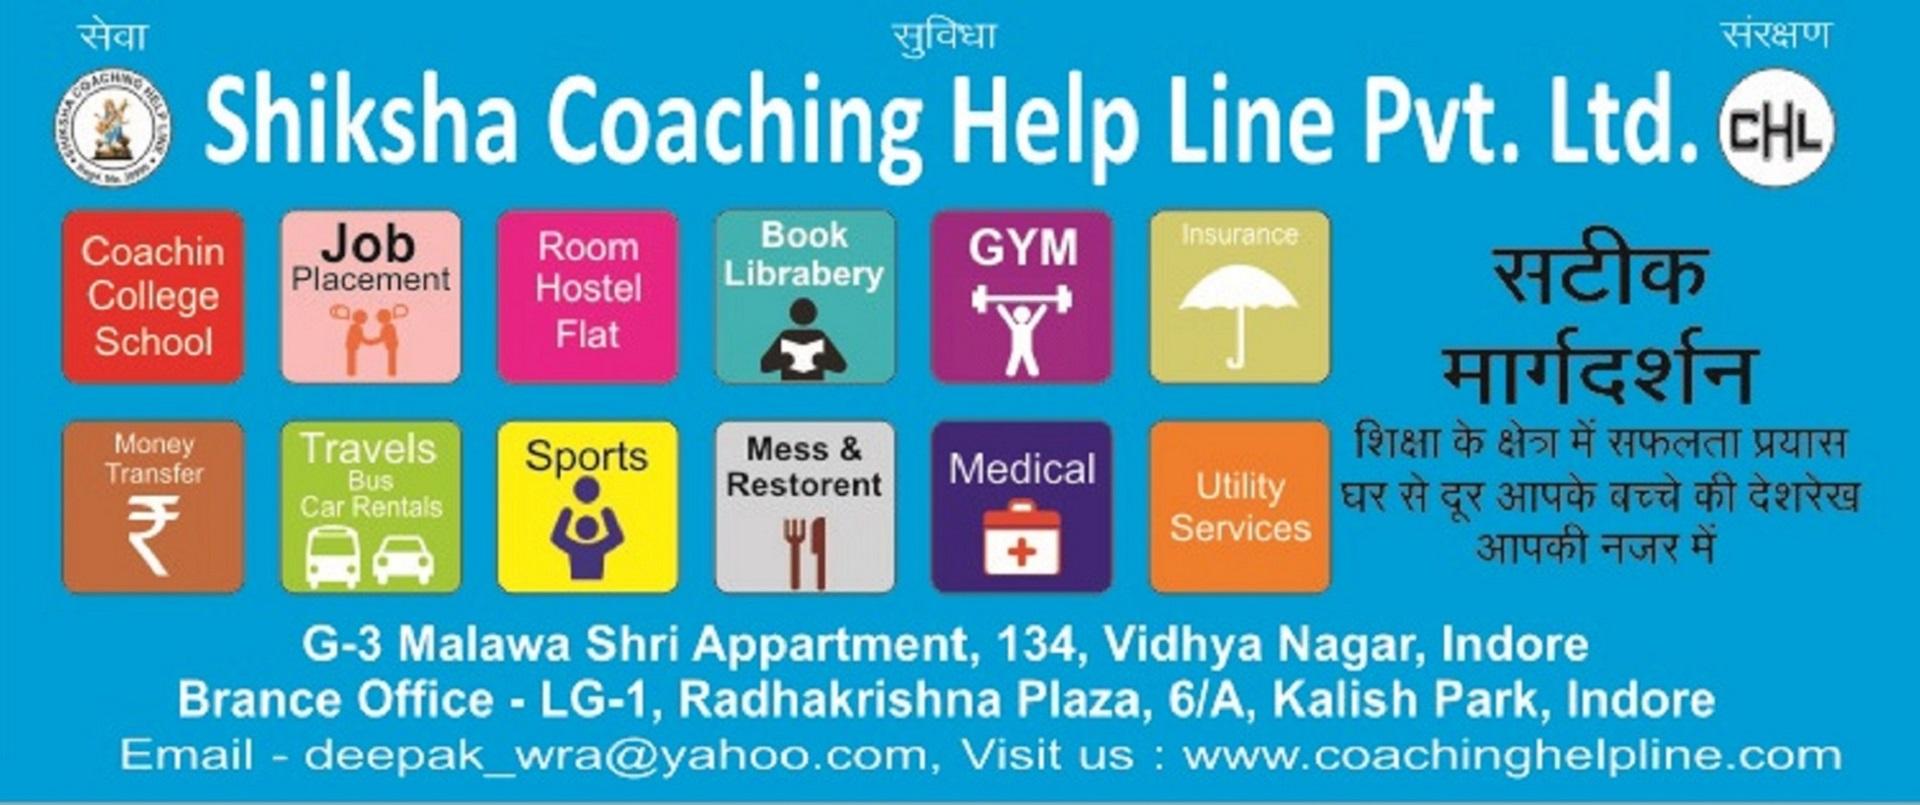 Shiksha Coaching Help Line